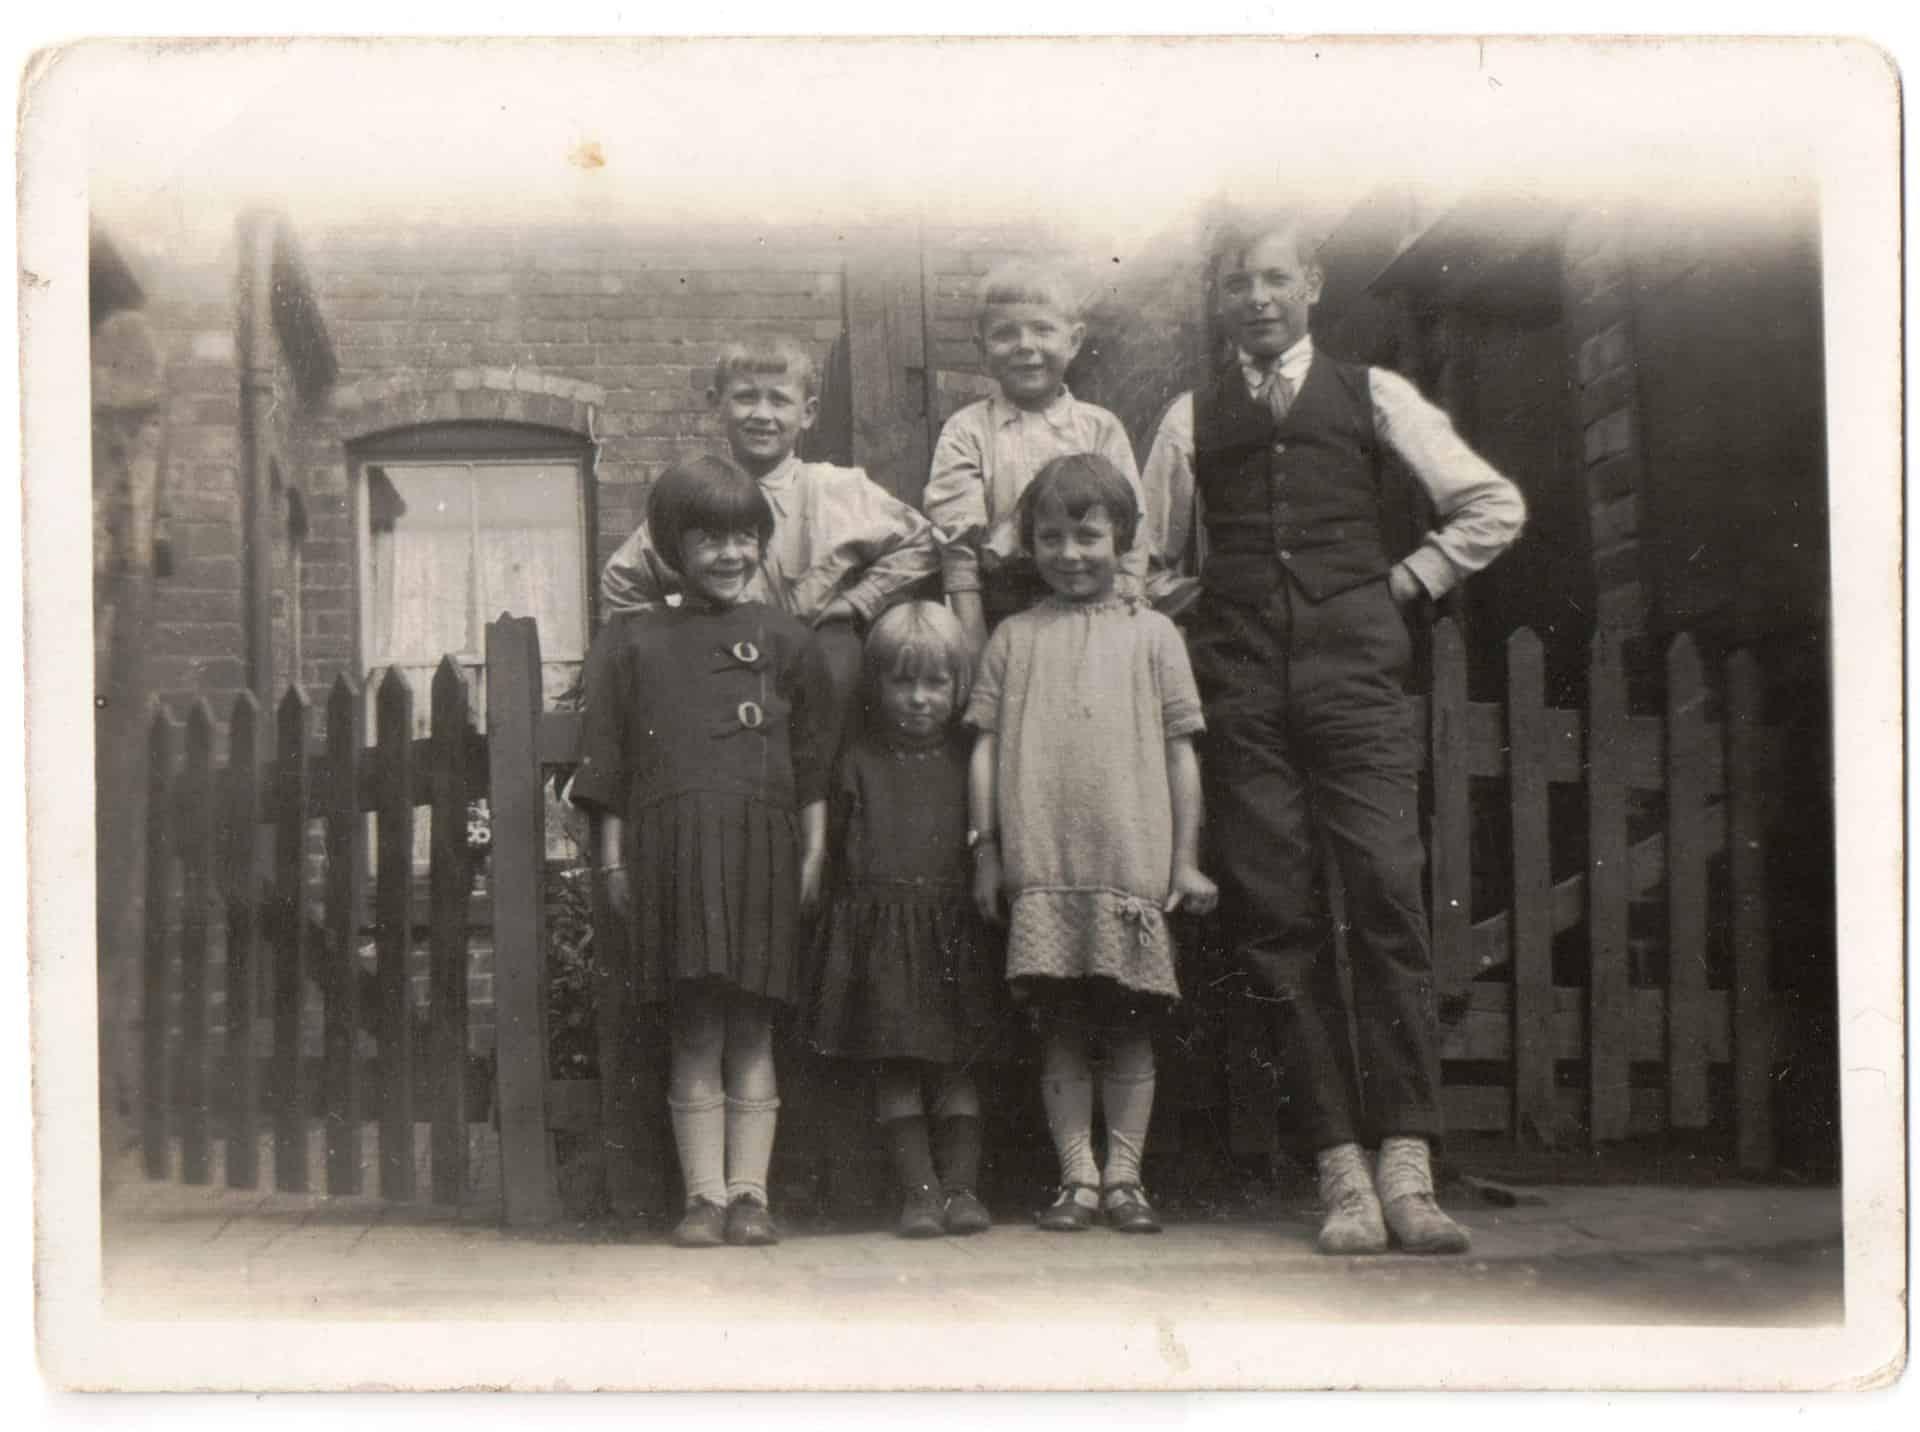 Smethwick, circa 1928